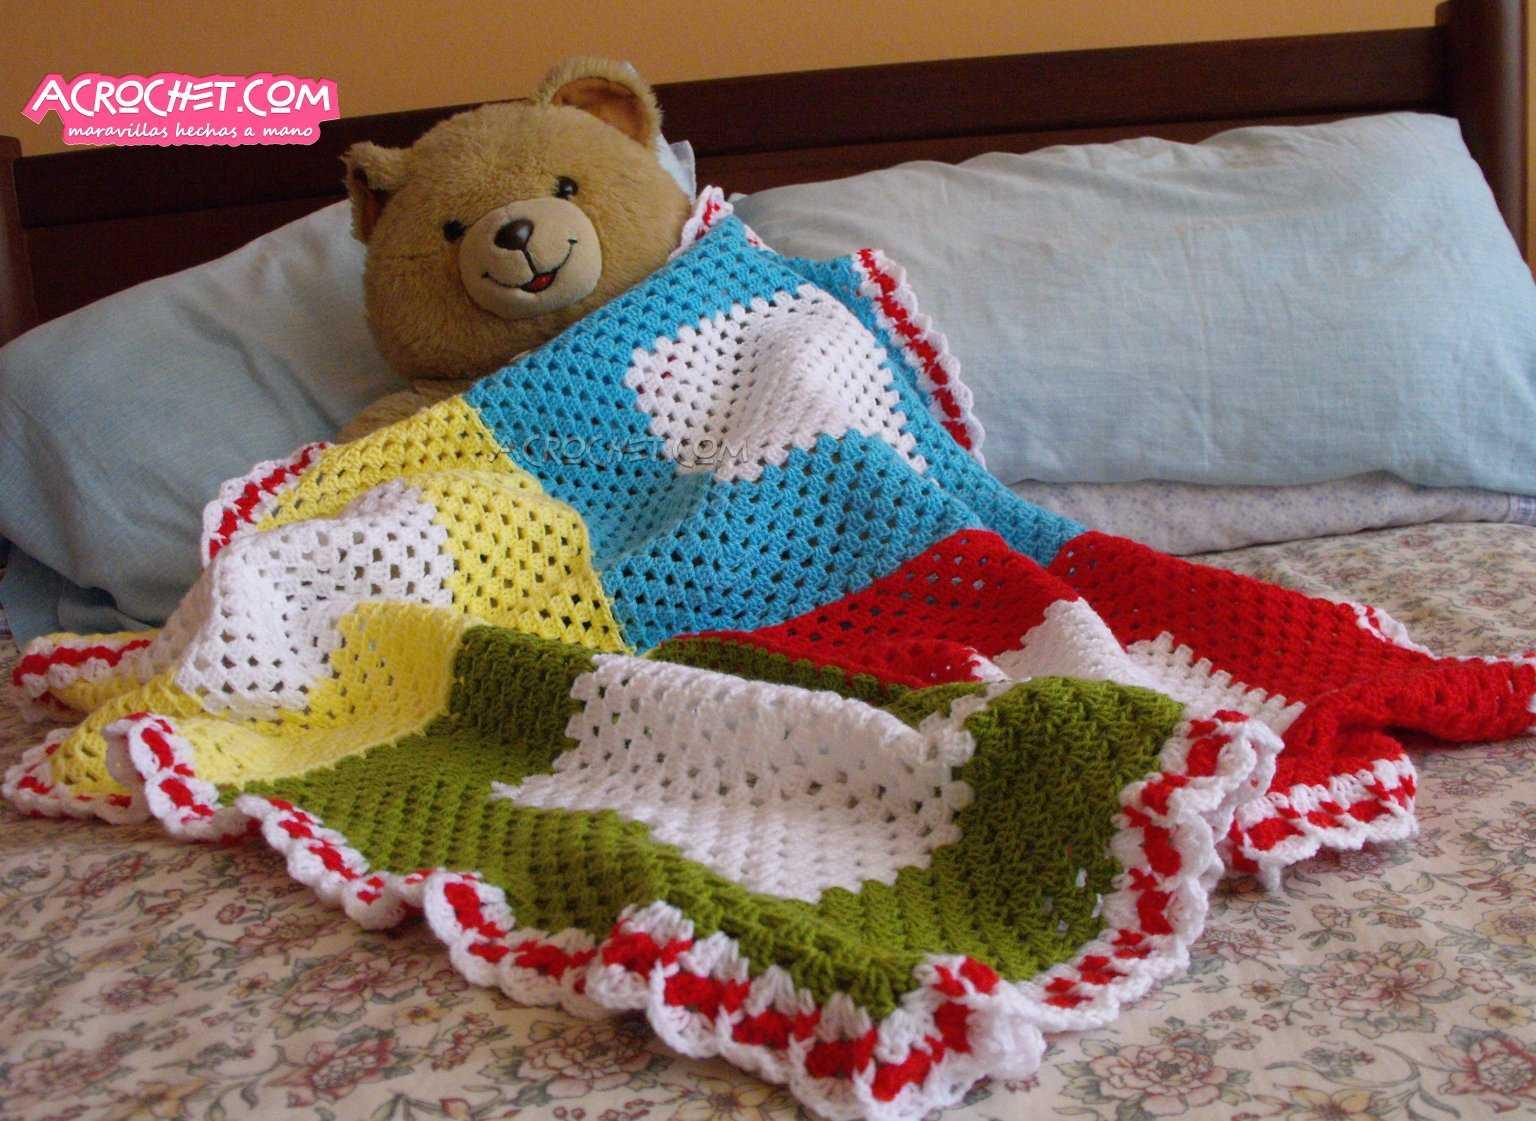 manta | Blog a Crochet - ACrochet